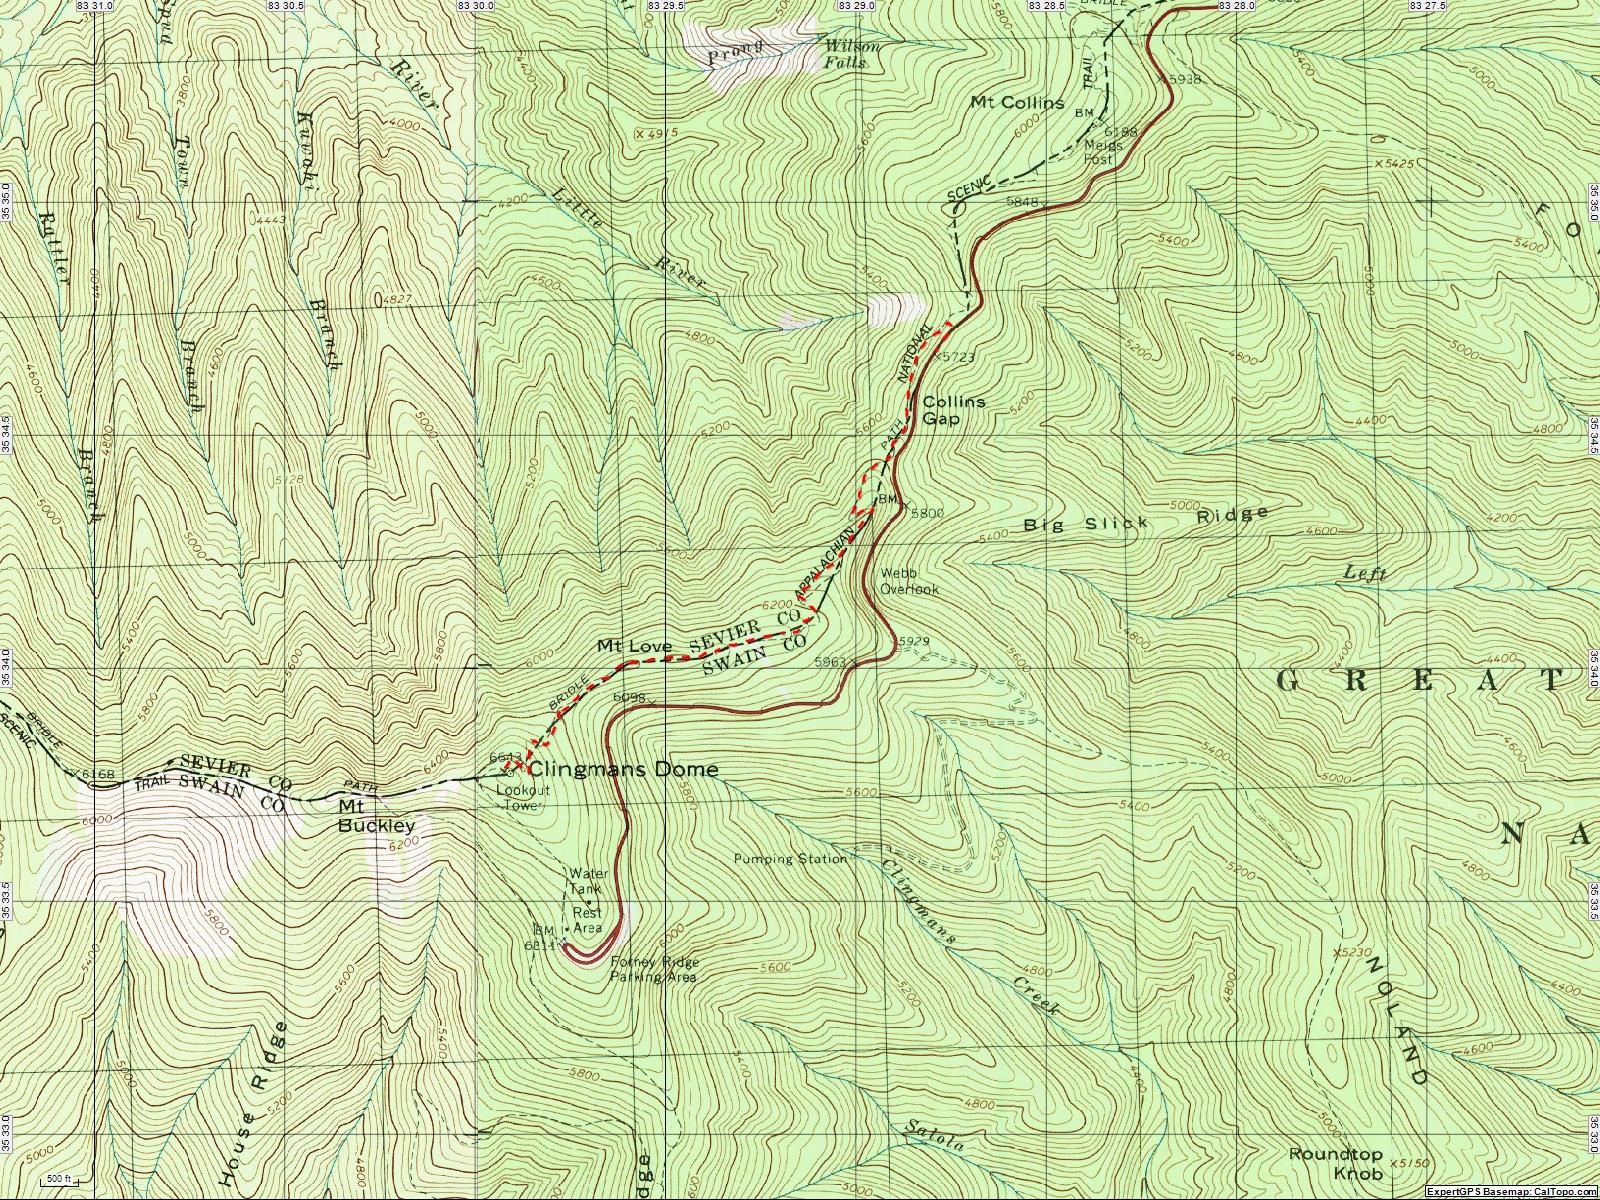 American Travel Journal Clingmans Dome To Collins Gap Appalachian - Appalachian trail topo map